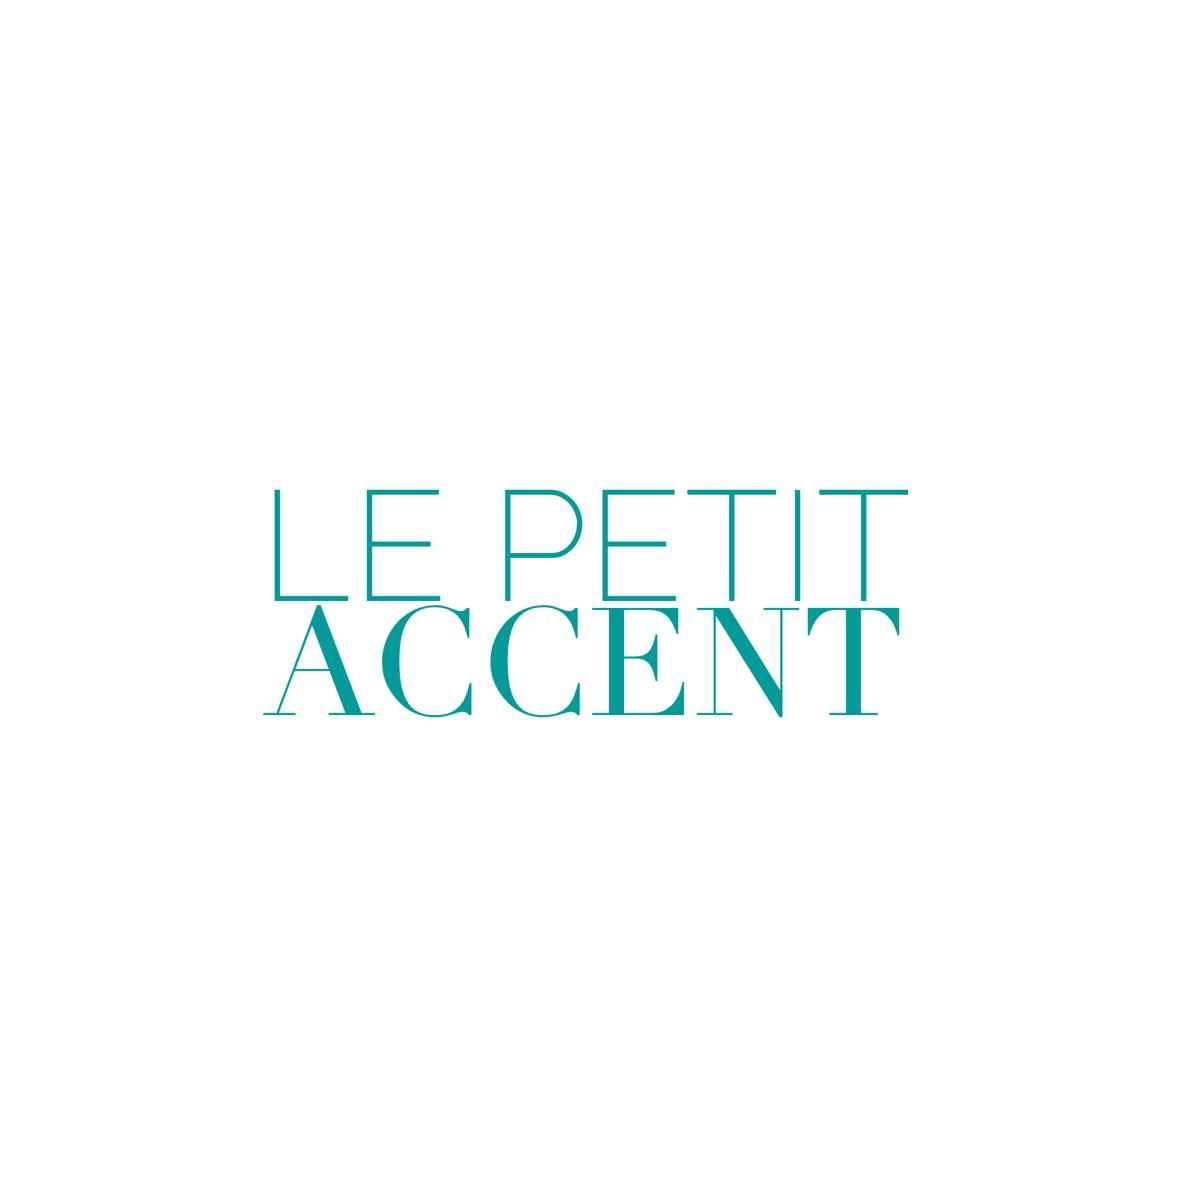 Lepetitaccent logo